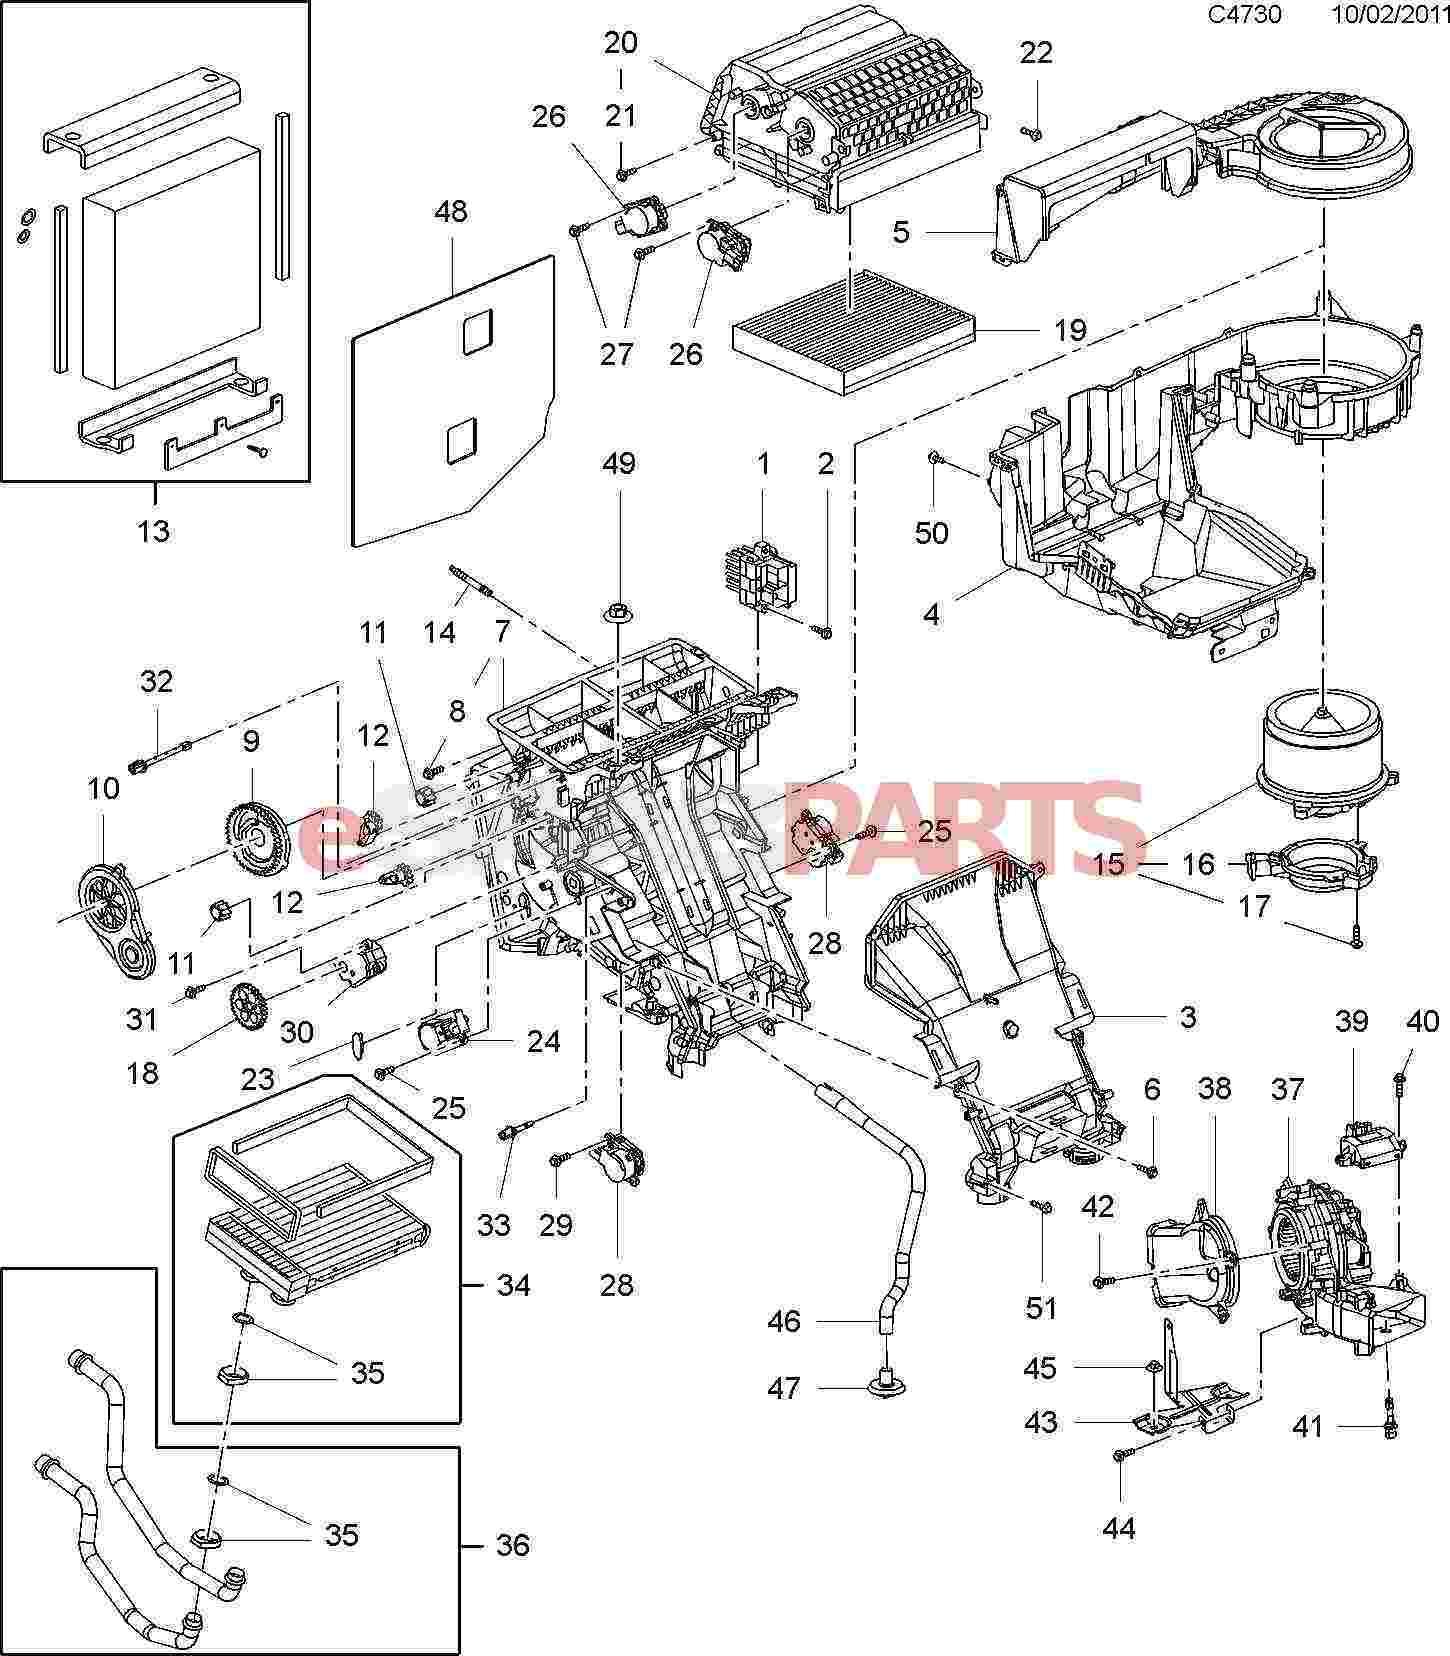 11609829] saab screw genuine saab parts from esaabparts comview all parts in diagram